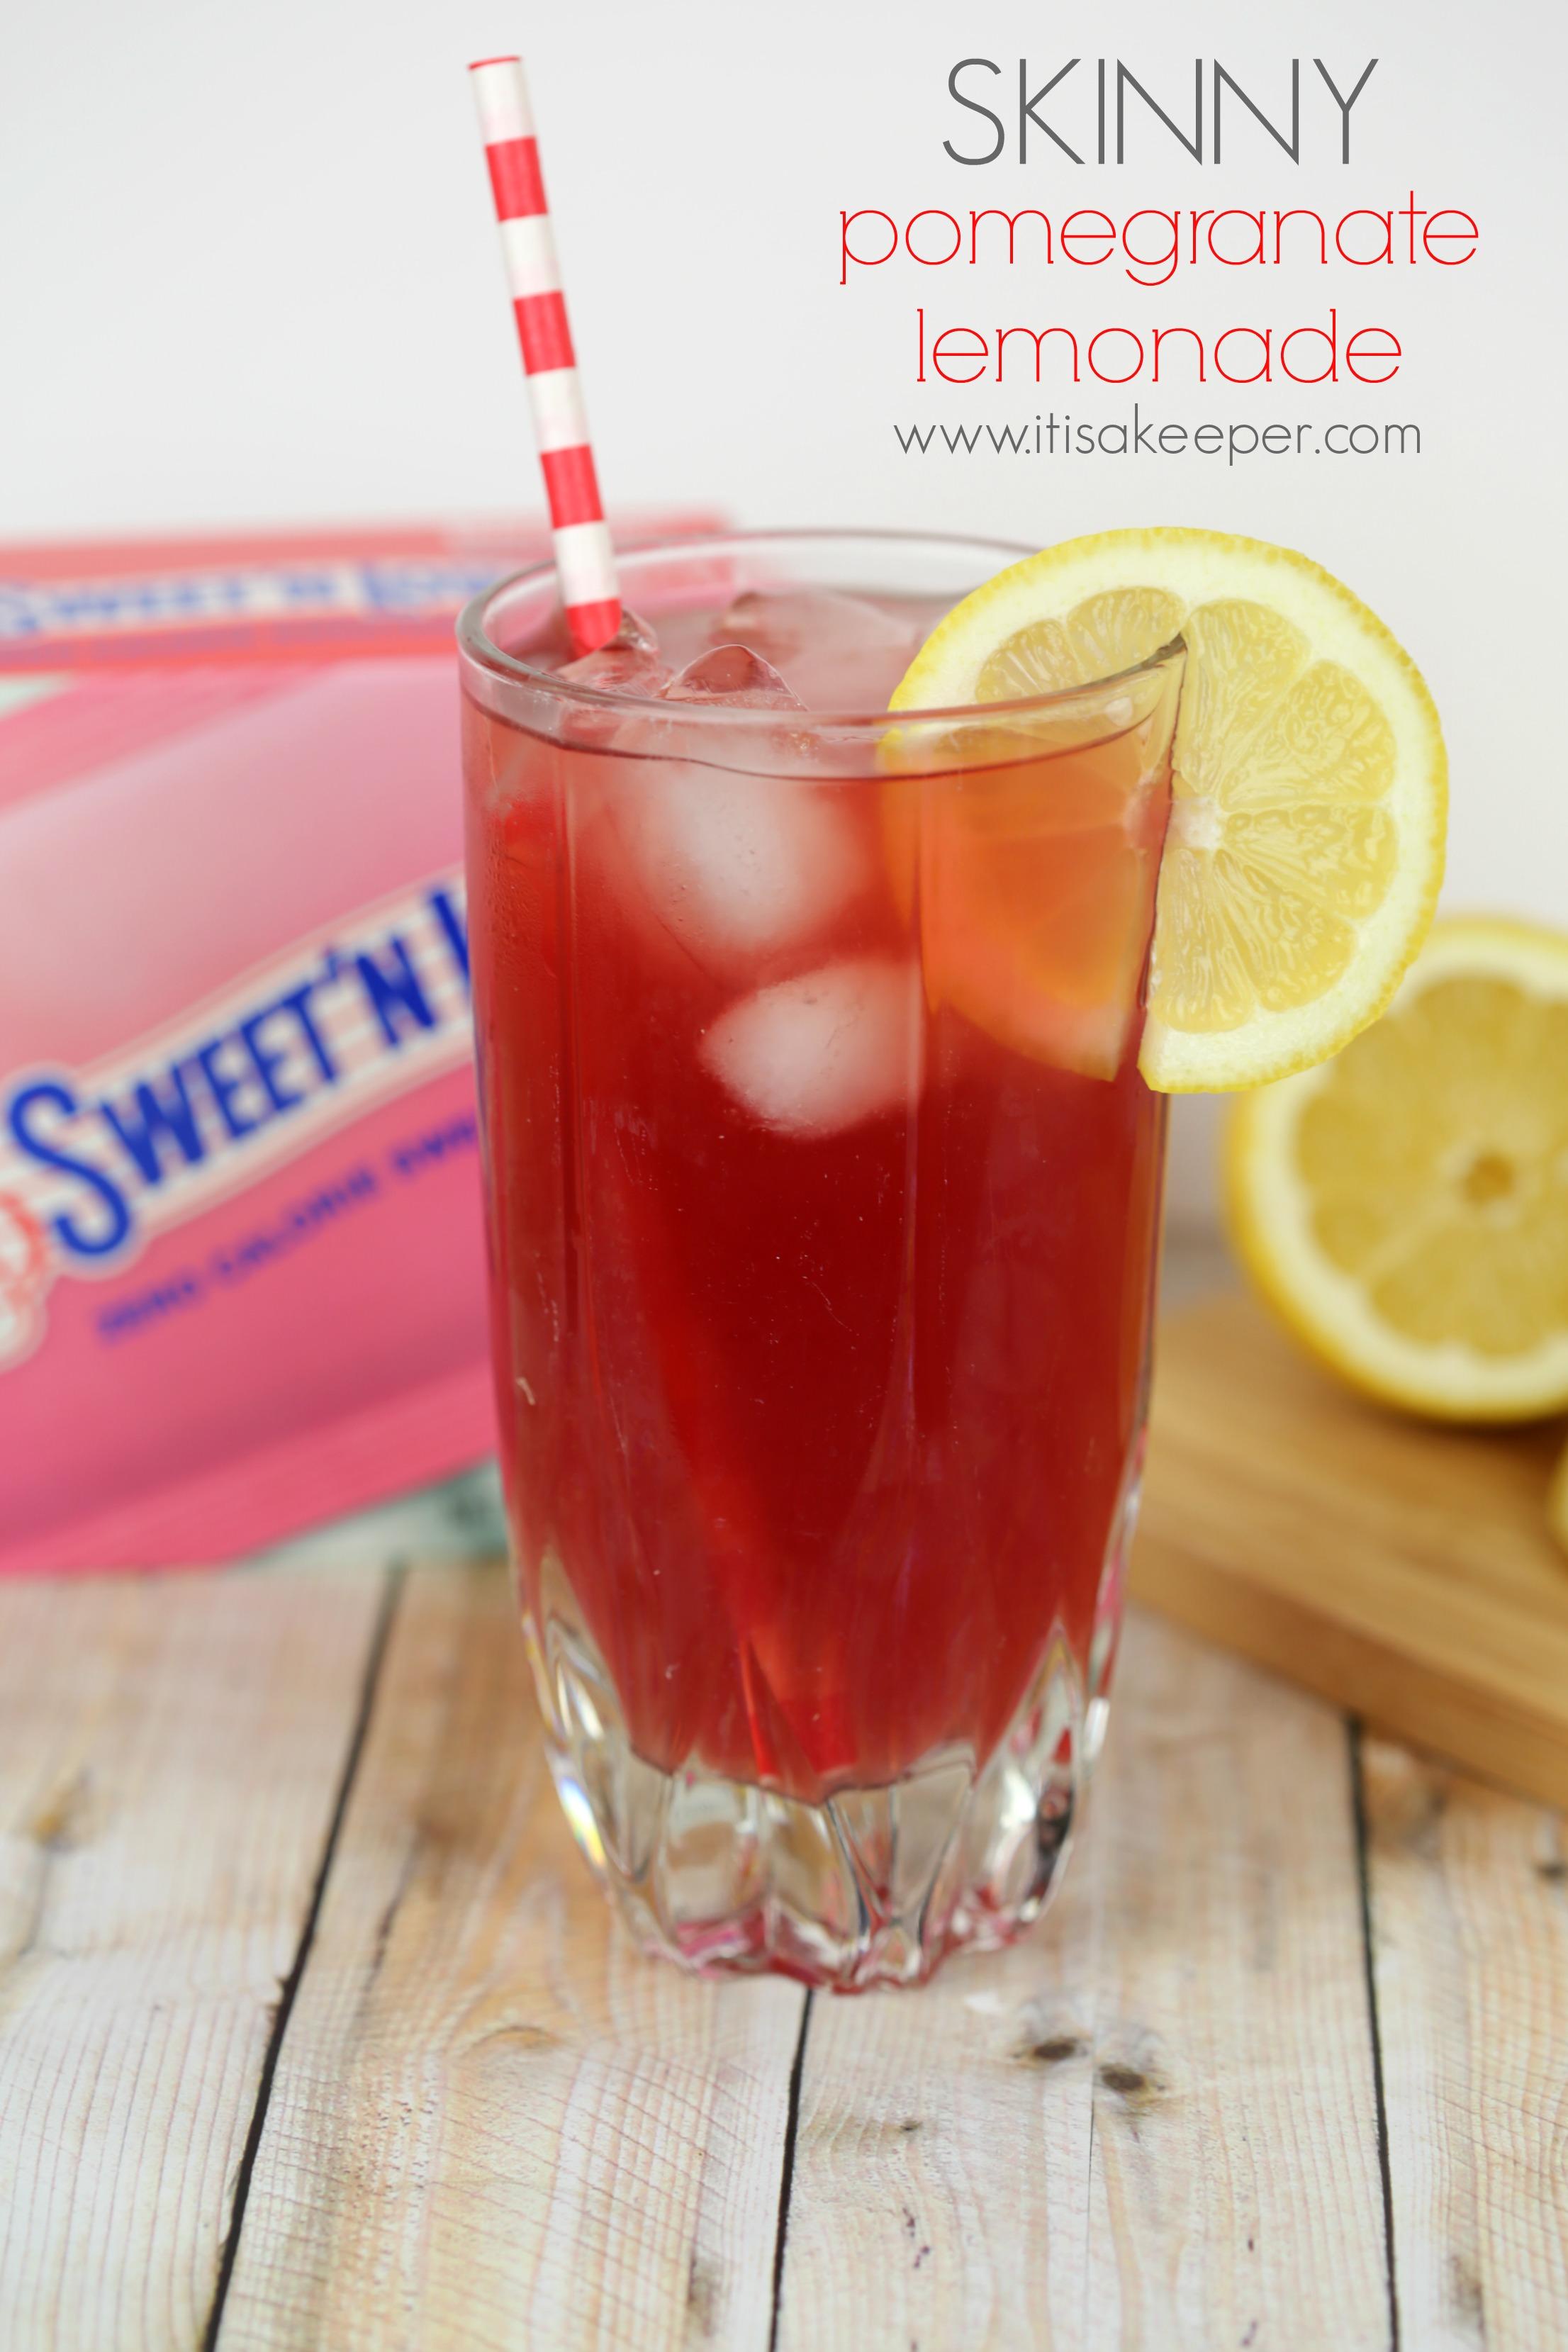 Skinny Pomegranate Lemonade